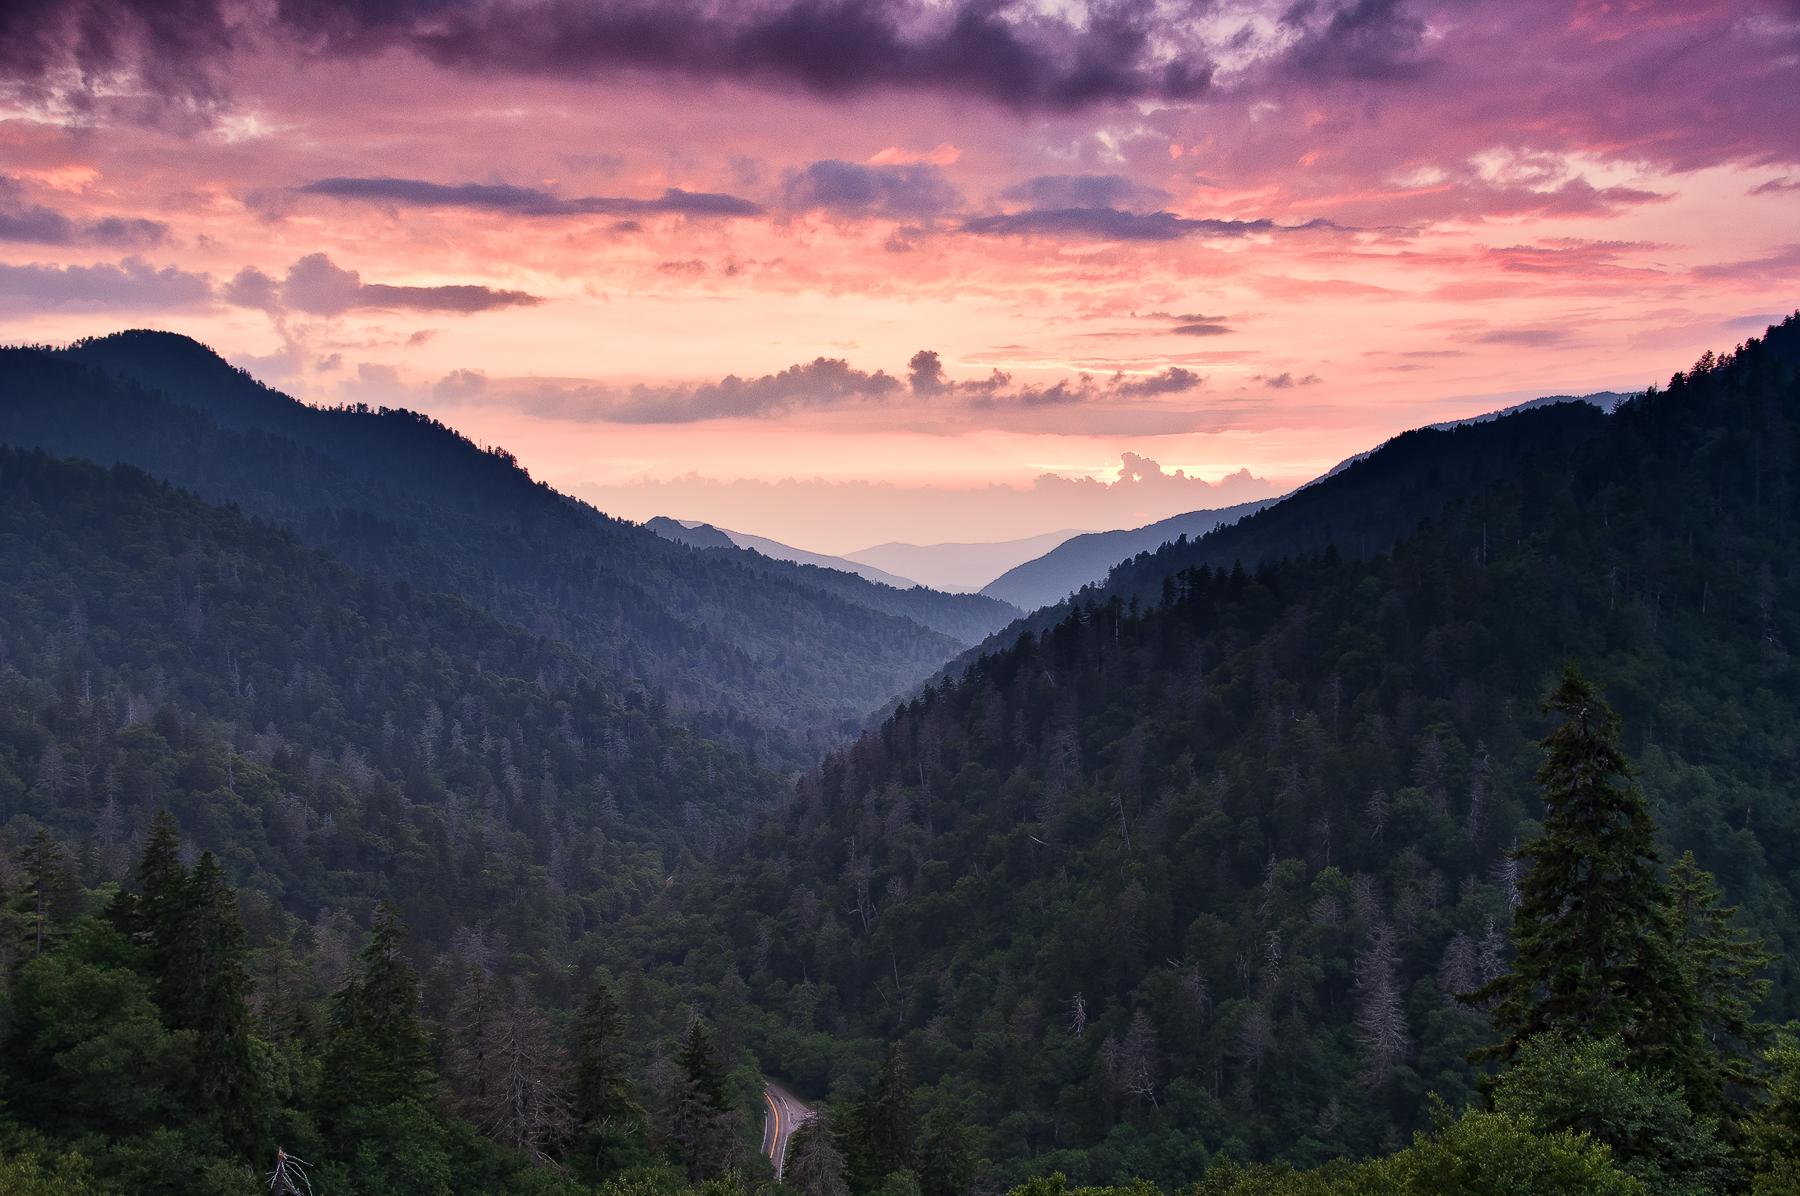 morton's overlook, great smoky mountains national park, sunset